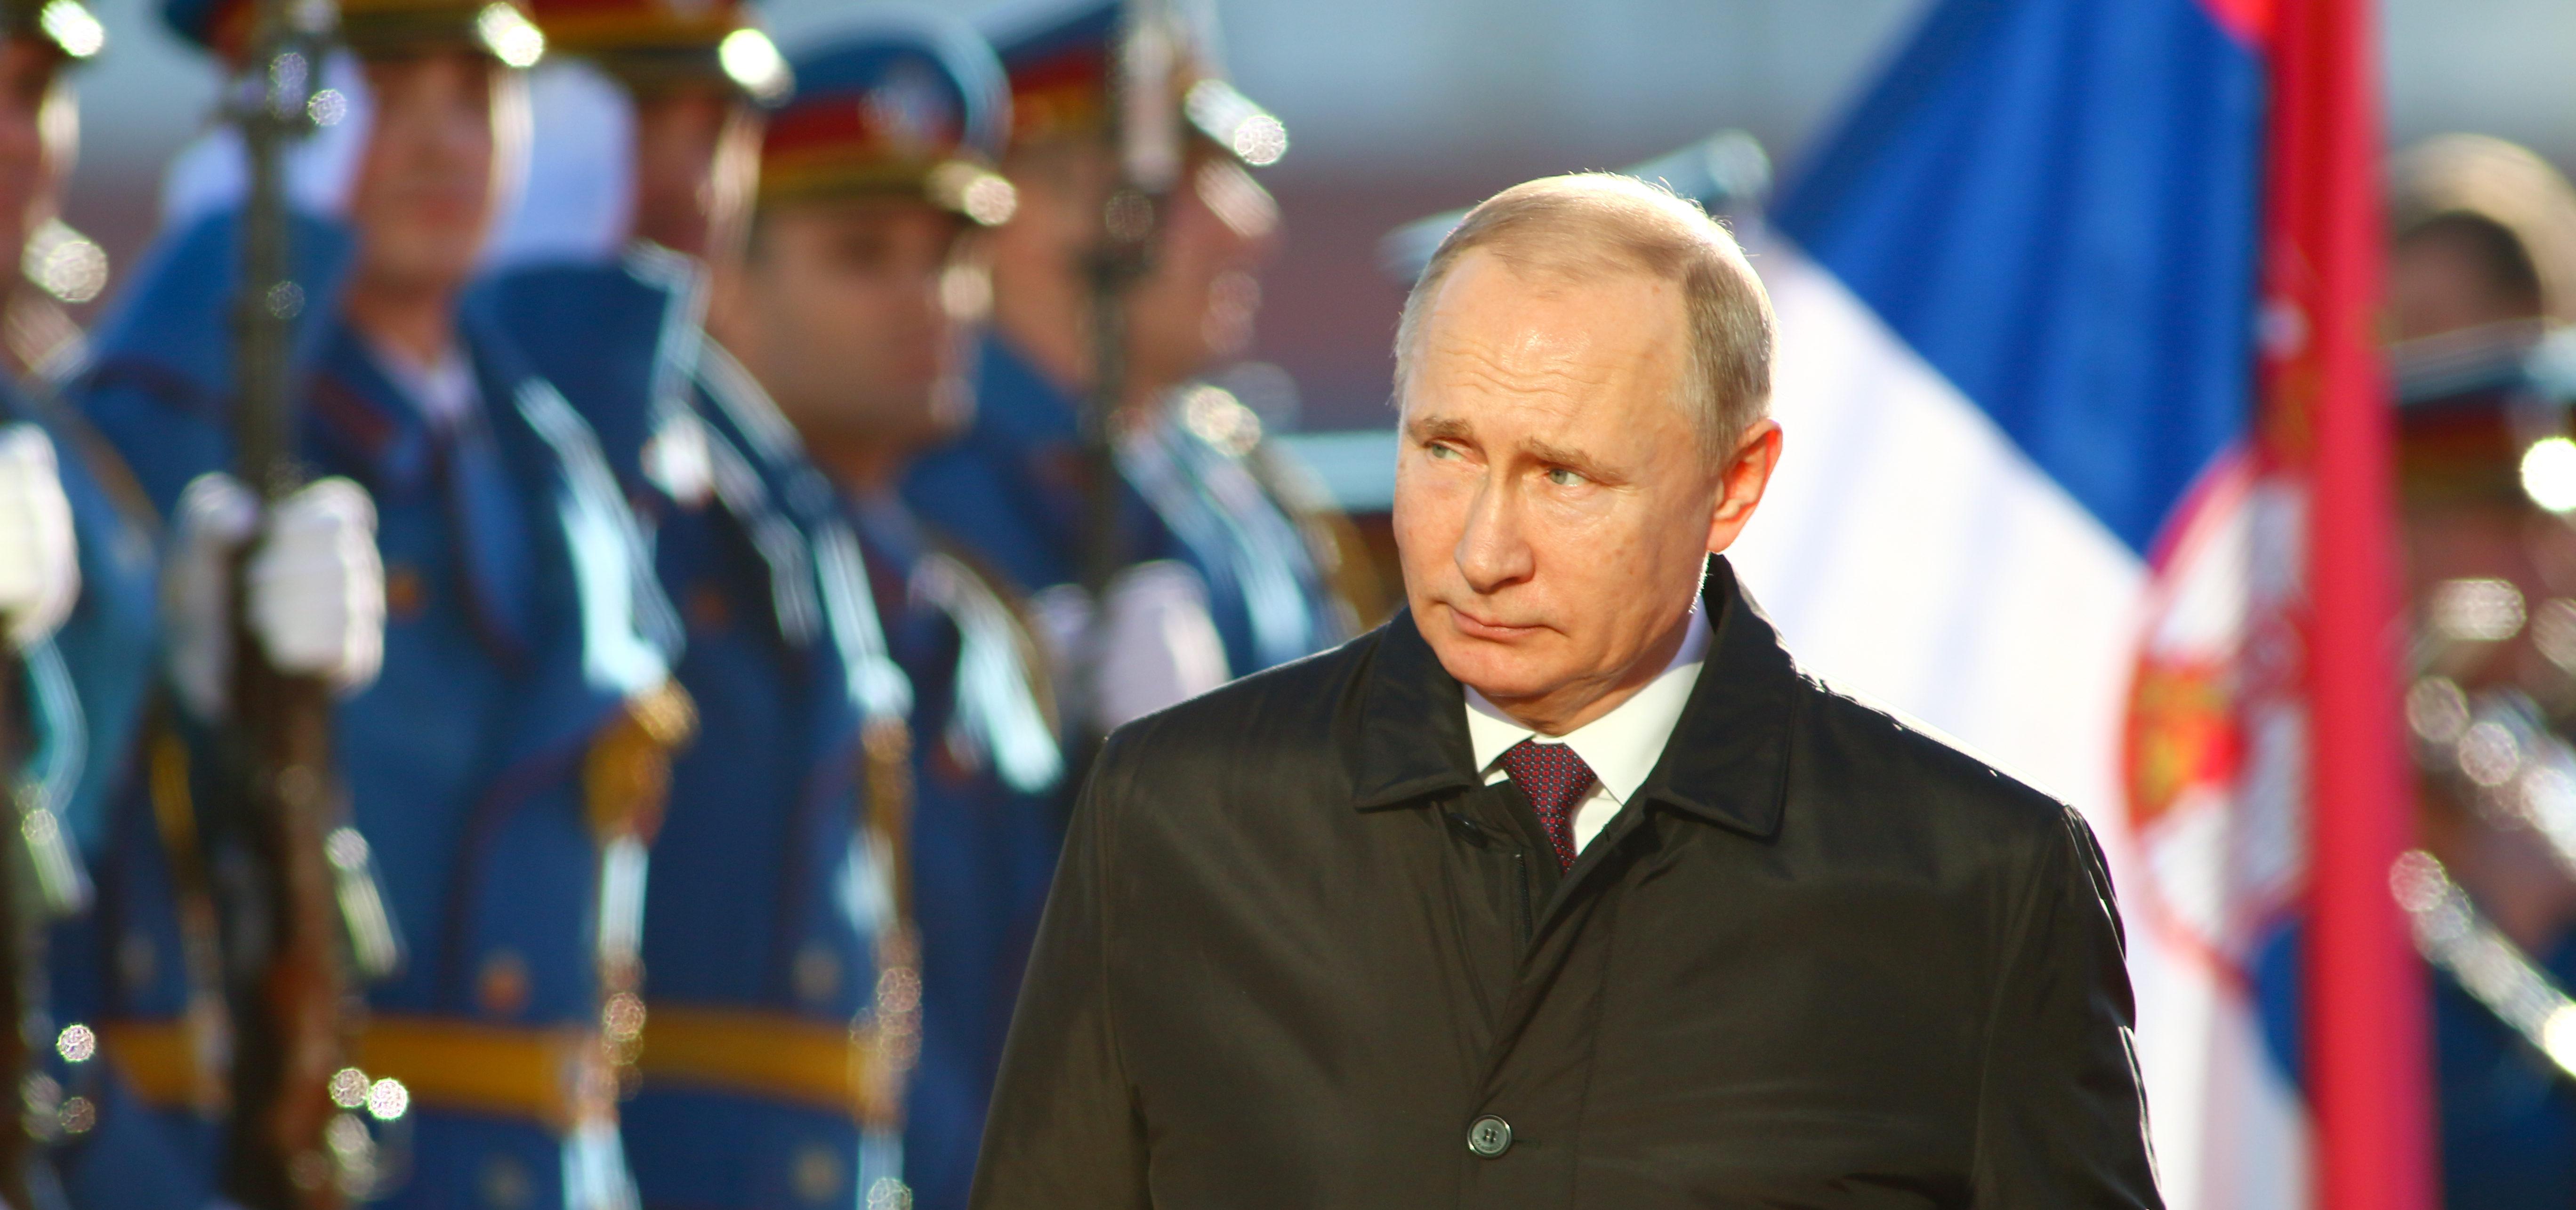 Belgrade, Serbia - January 17, 2019 : Vladimir Putin, the President Russia attending press conference (Shutterstock/Sasa Dzambic Photography)